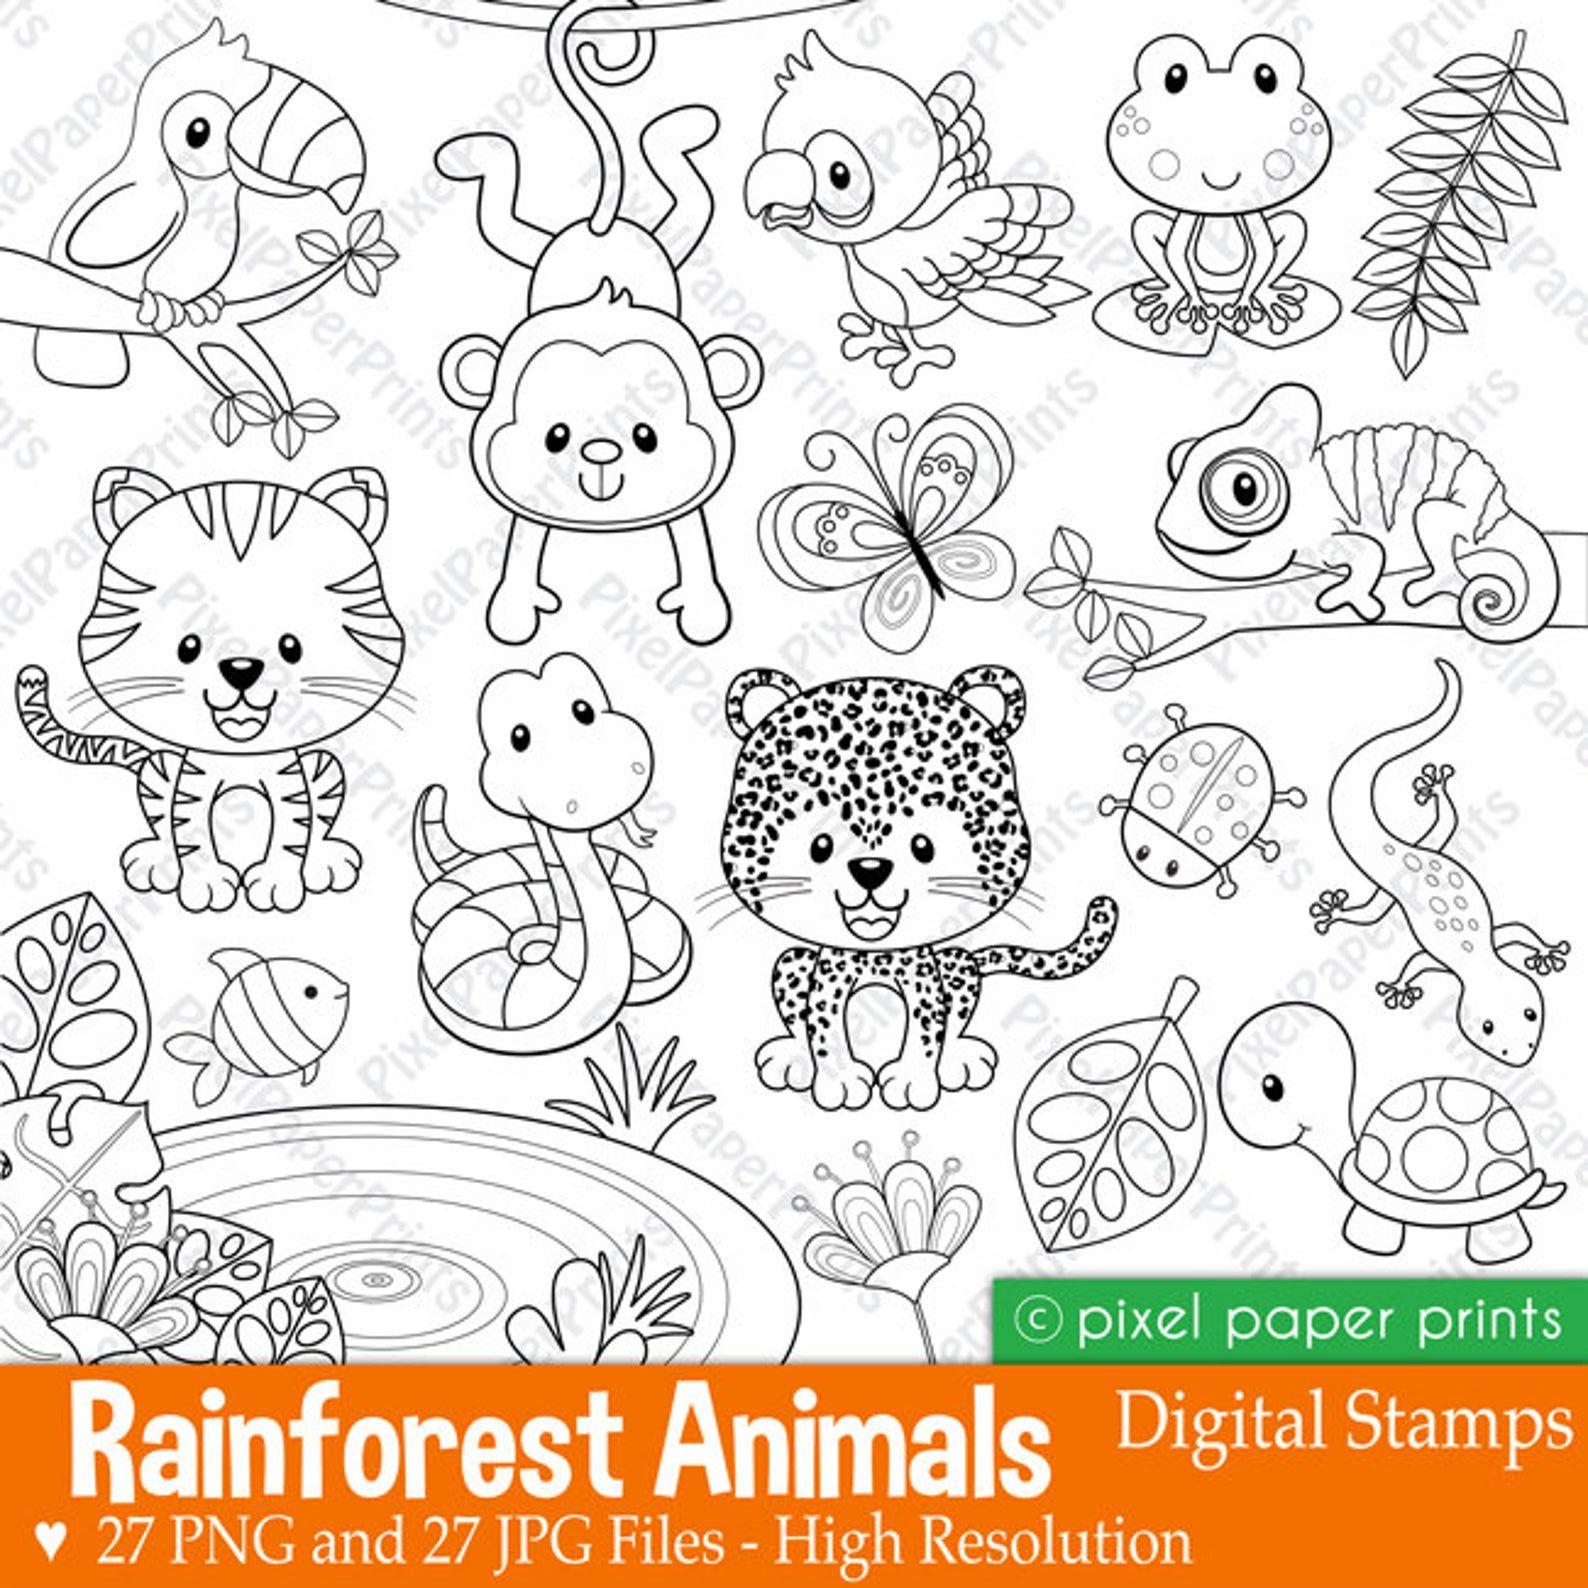 Rainforest Animals Digital Stamps Clipart Etsy Digital Stamps Rainforest Animals Digi Stamps